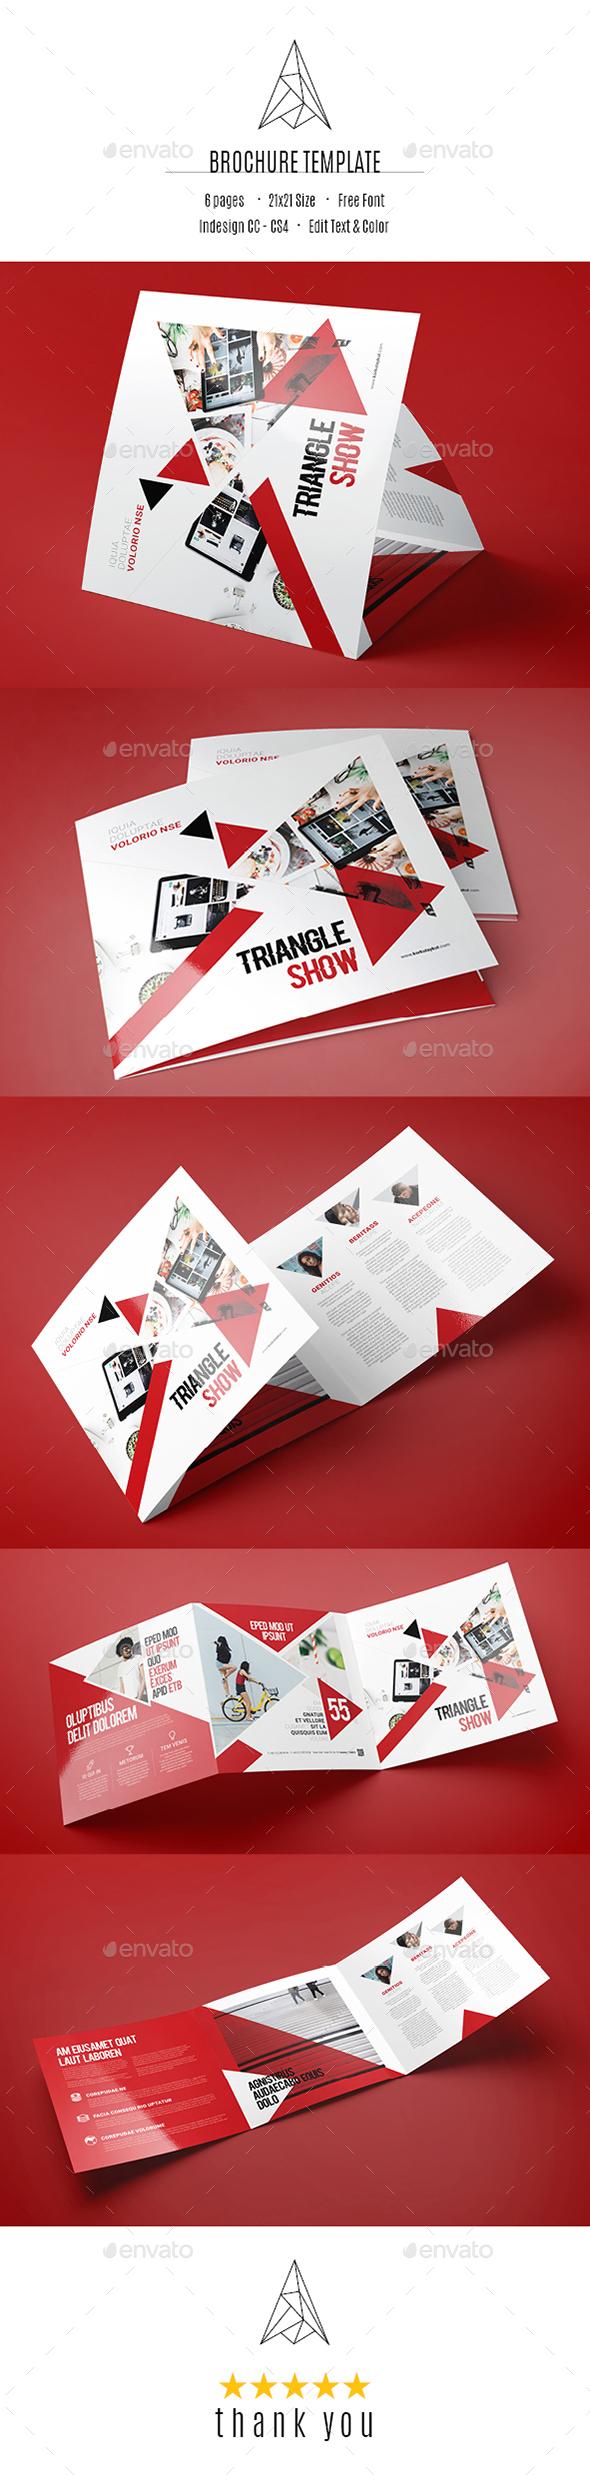 Brand Square Tri-Fold Brochure - Brochures Print Templates